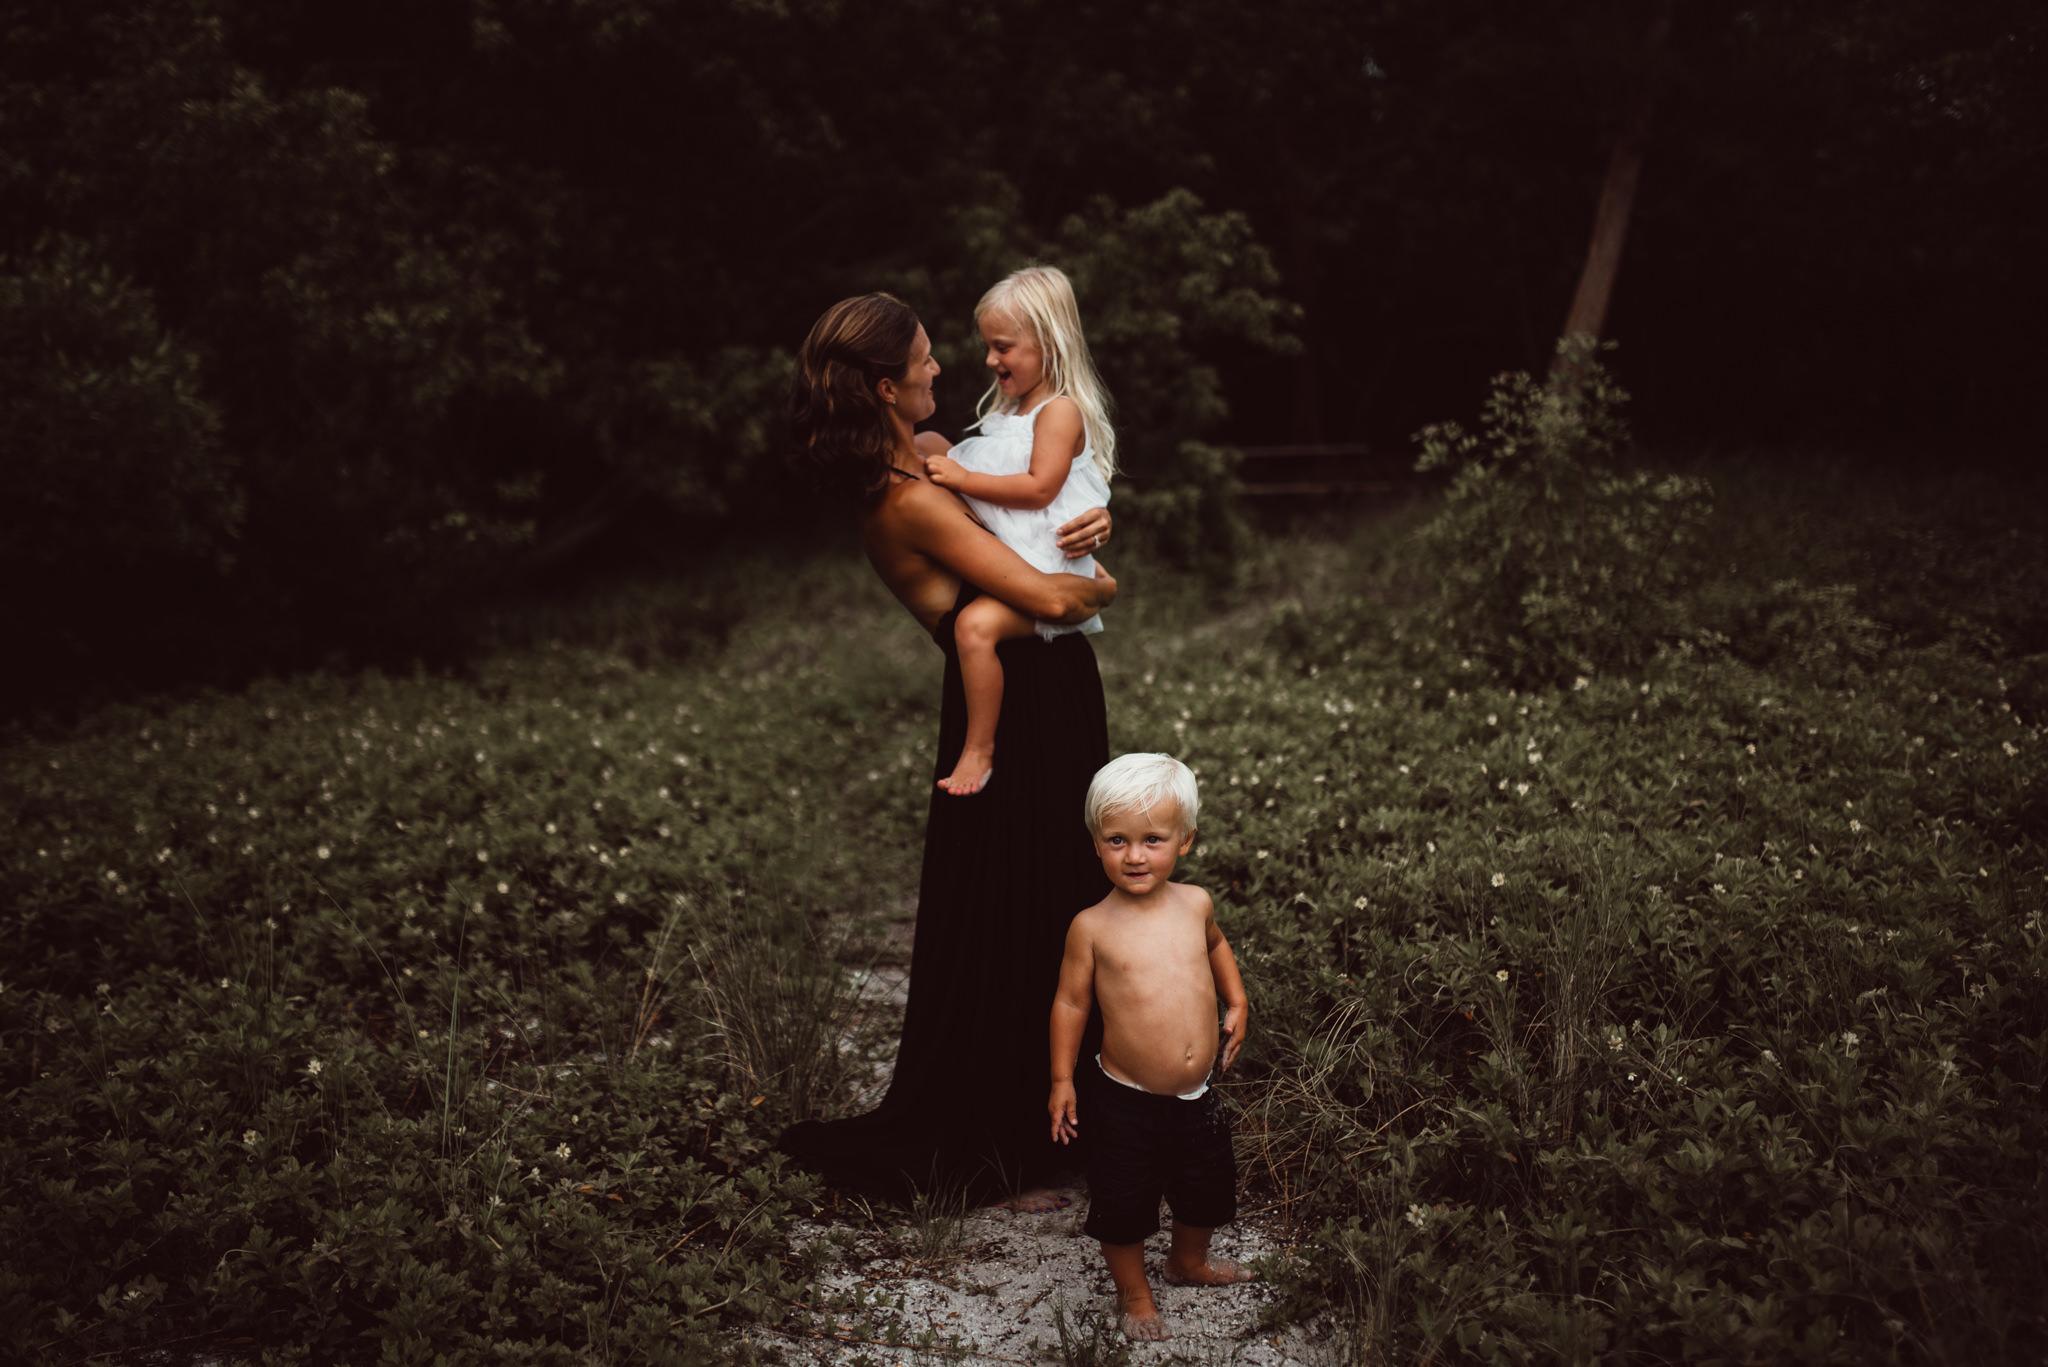 twyla jones photography - treasure coast florida - island family session-5000.jpg